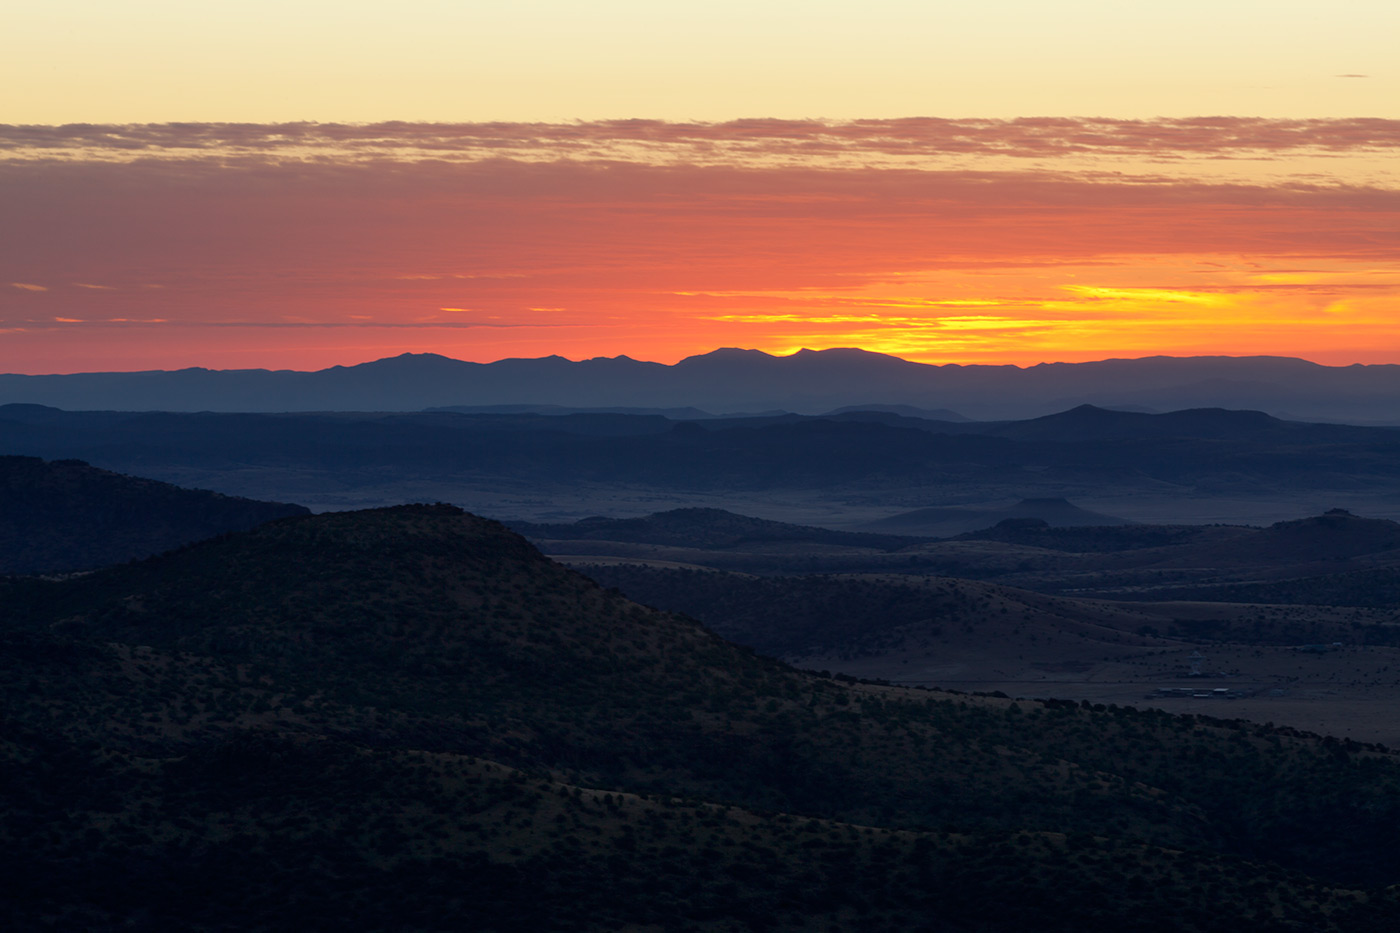 McDonald-Observatory-ABP-Davis-Mountains_Sunrise.jpg